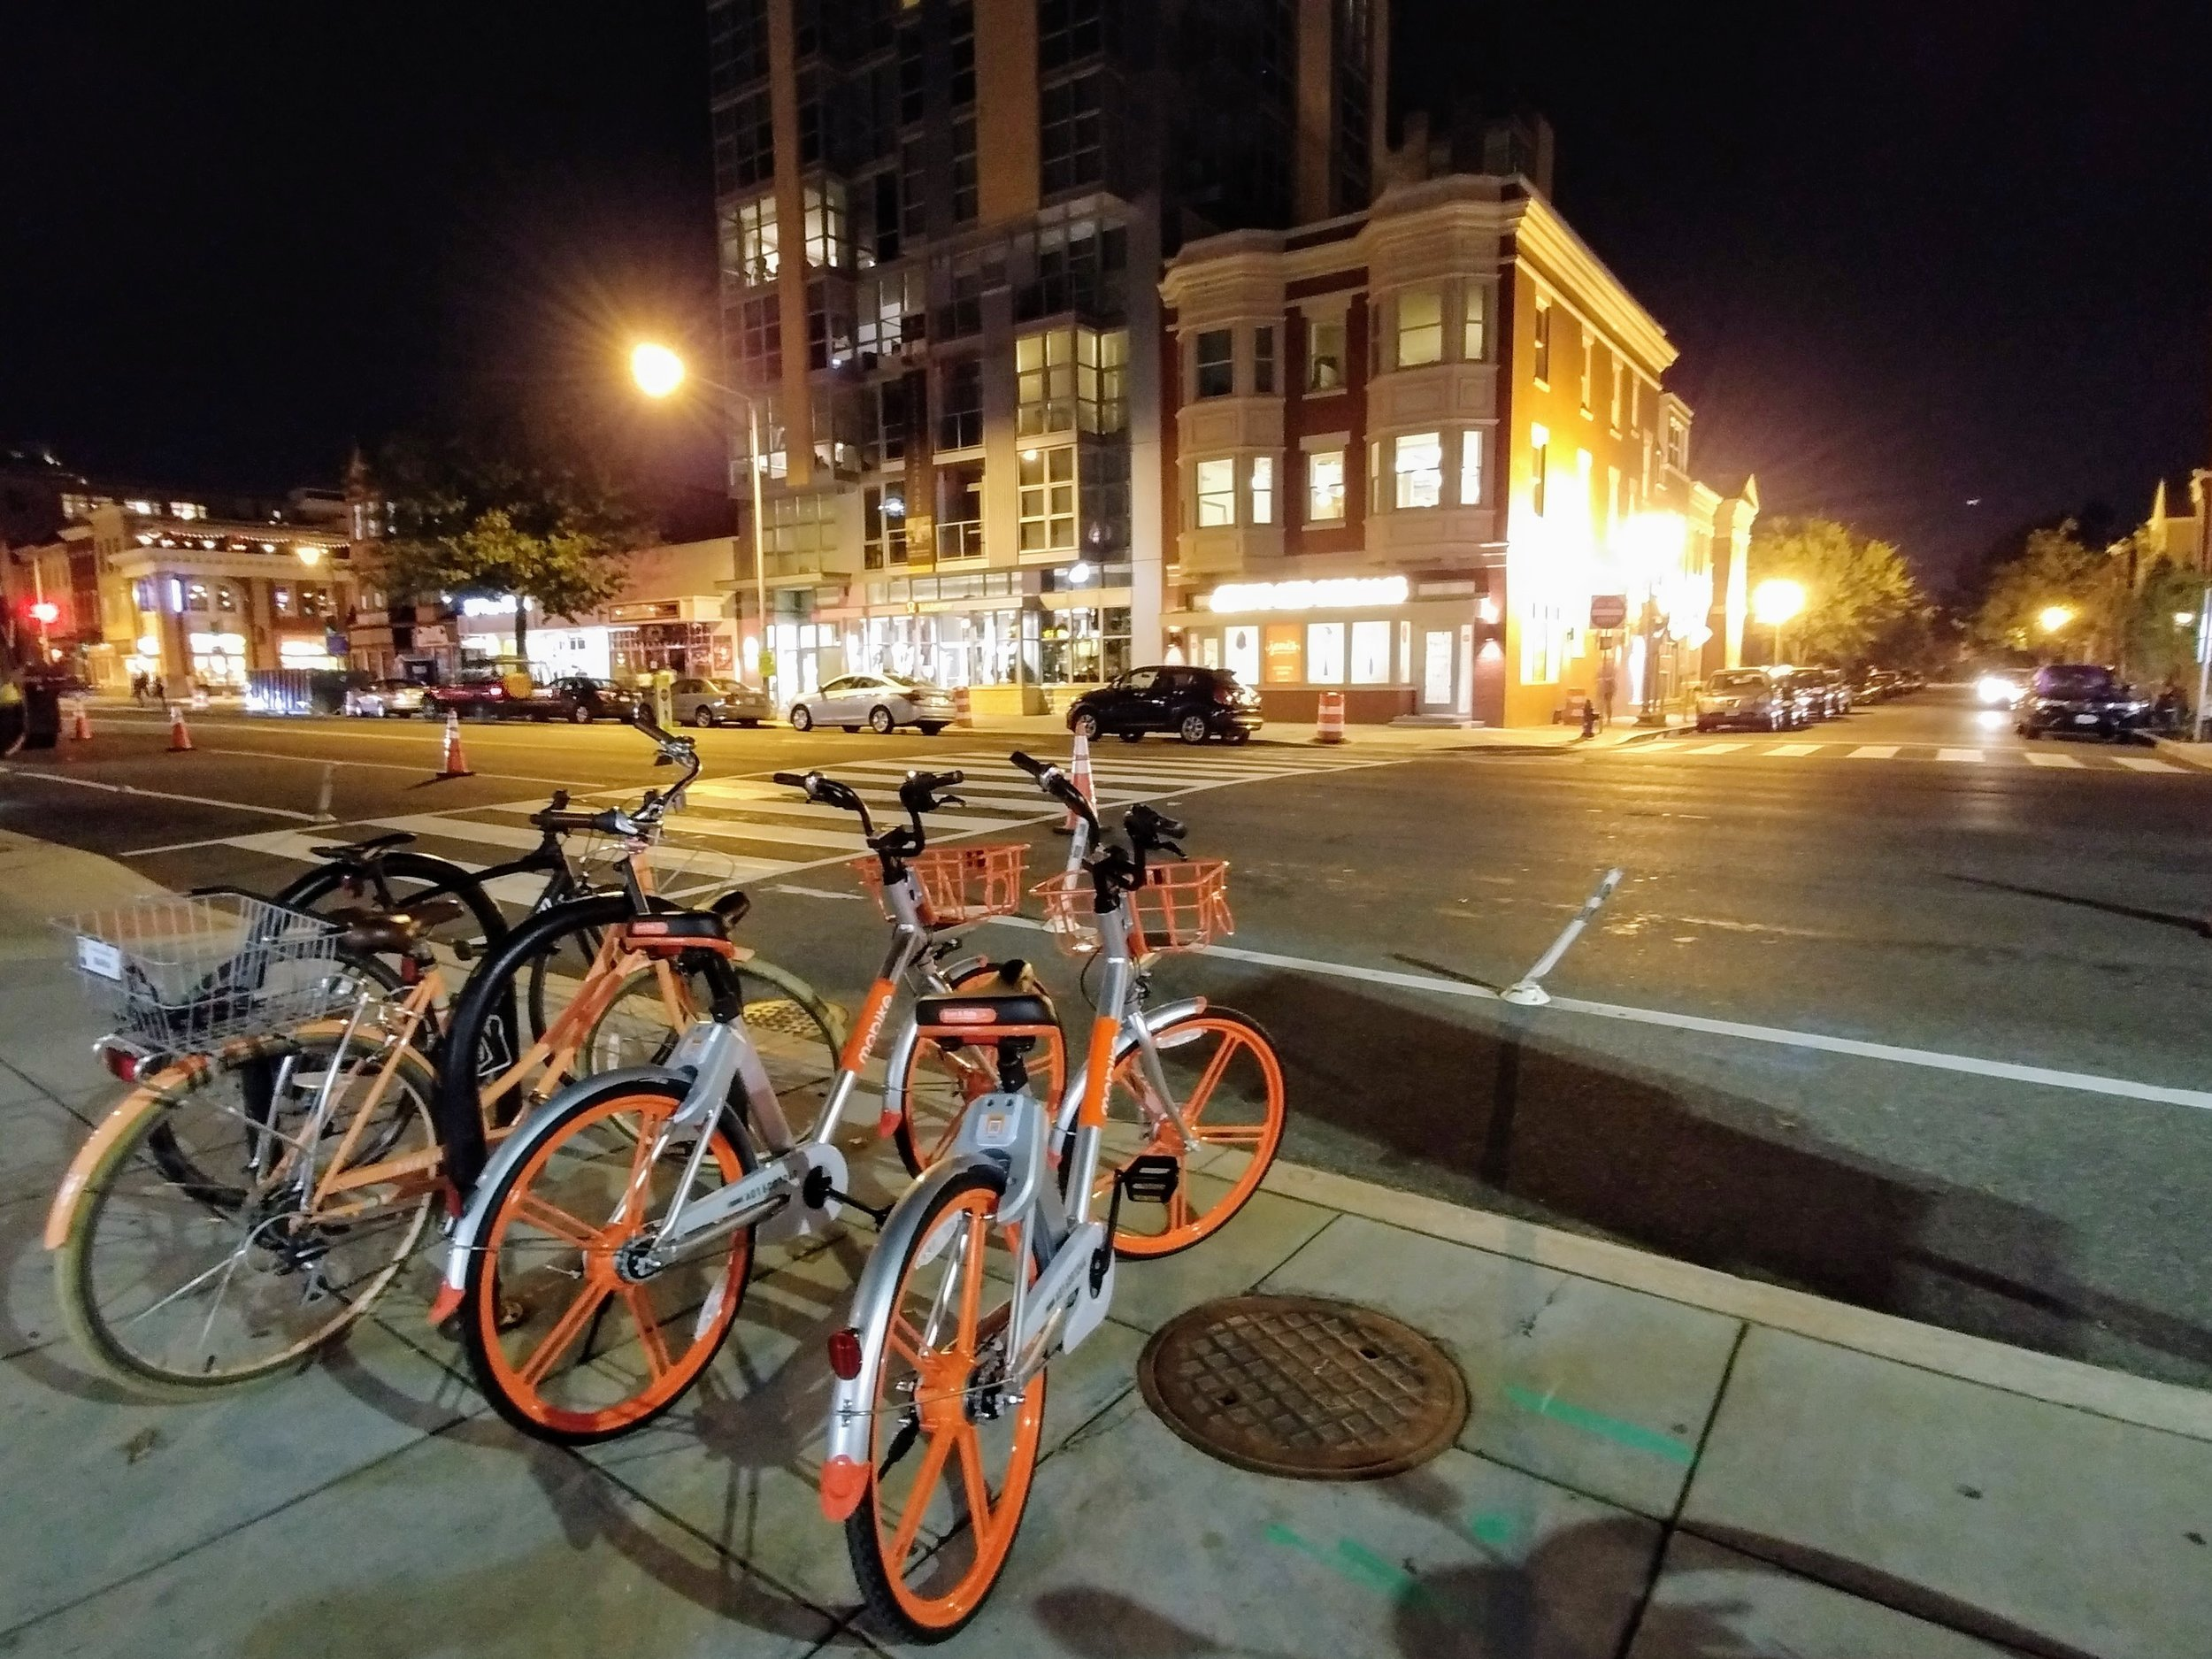 Shared bikes near U Street NW.